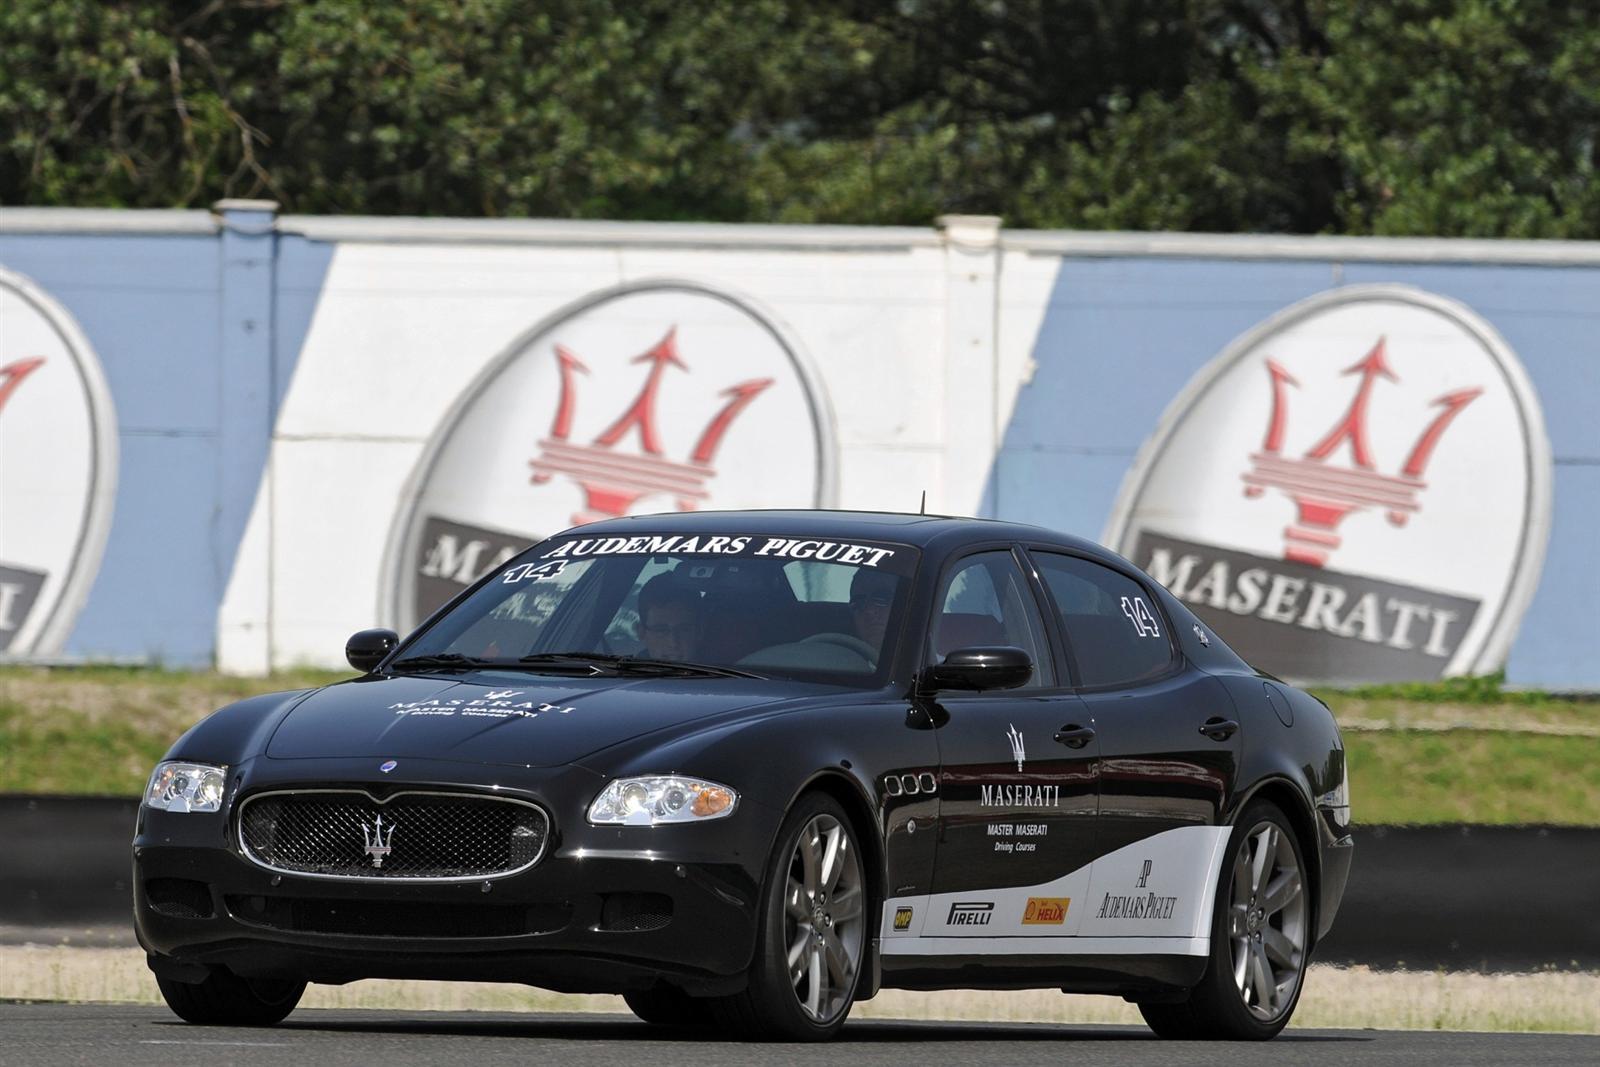 2010 Maserati GranTurismo Image